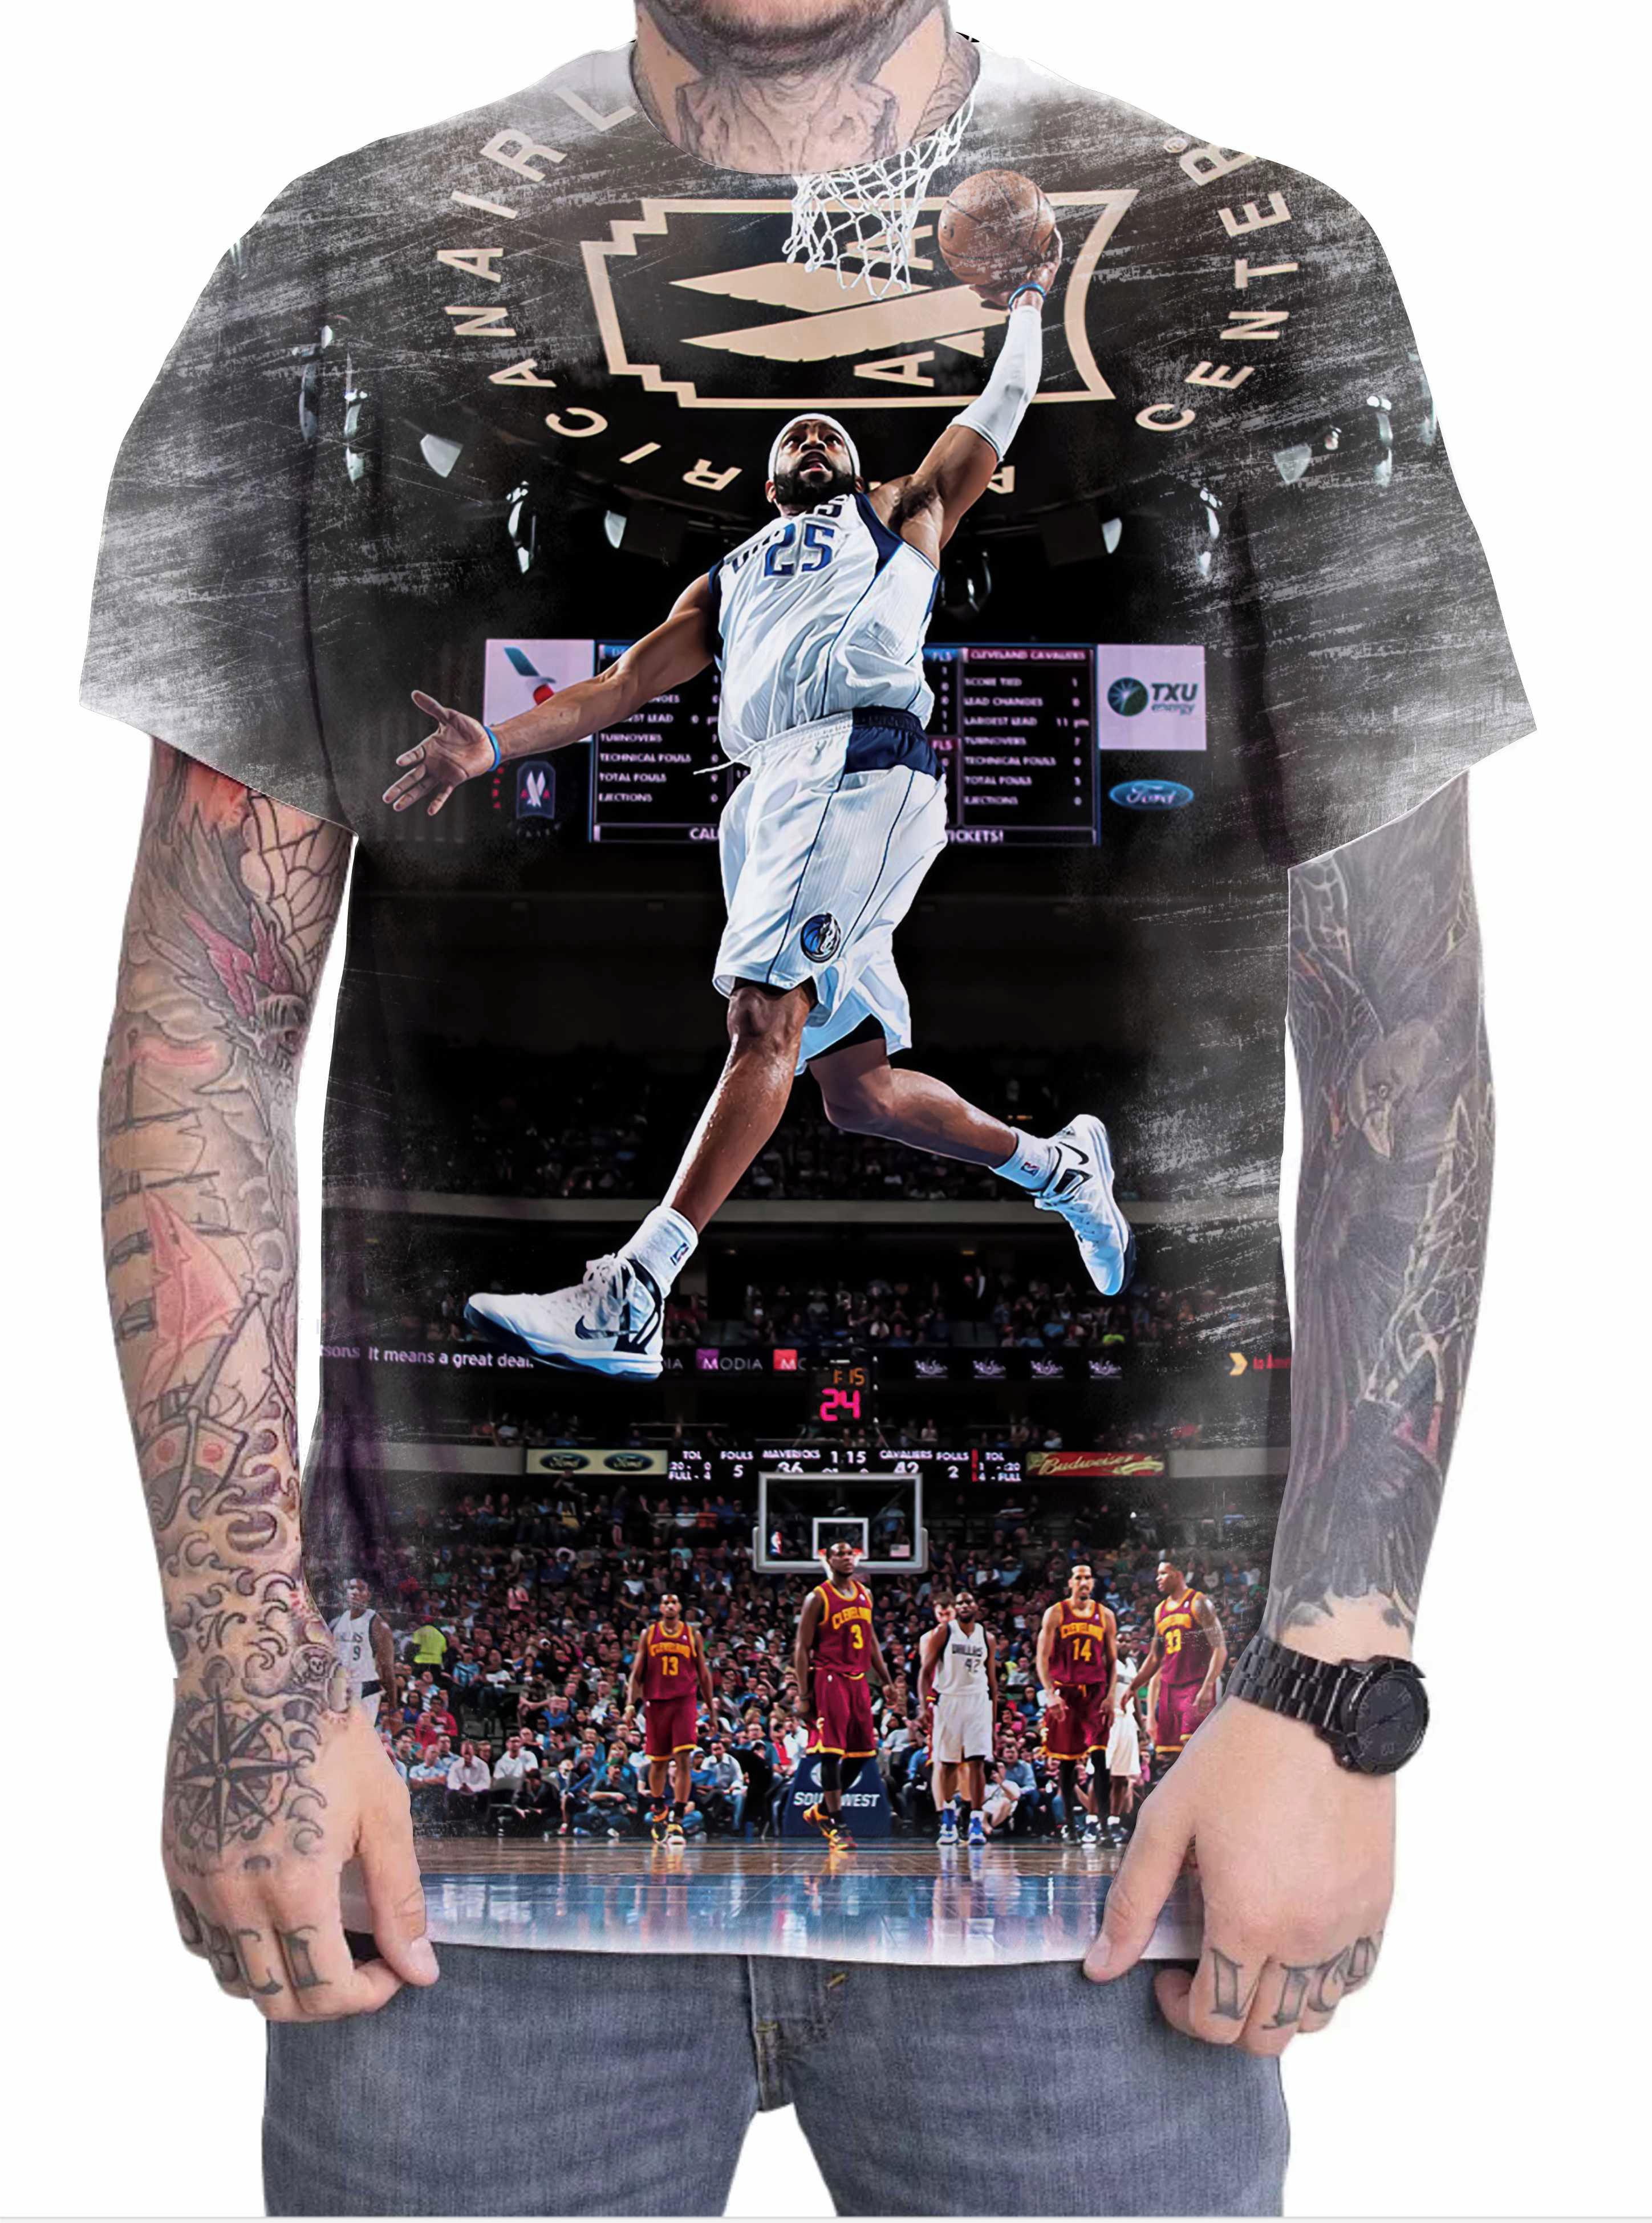 deb9c26b459 Camiseta Camisa Personalizada Allen Iverson Basquete 09